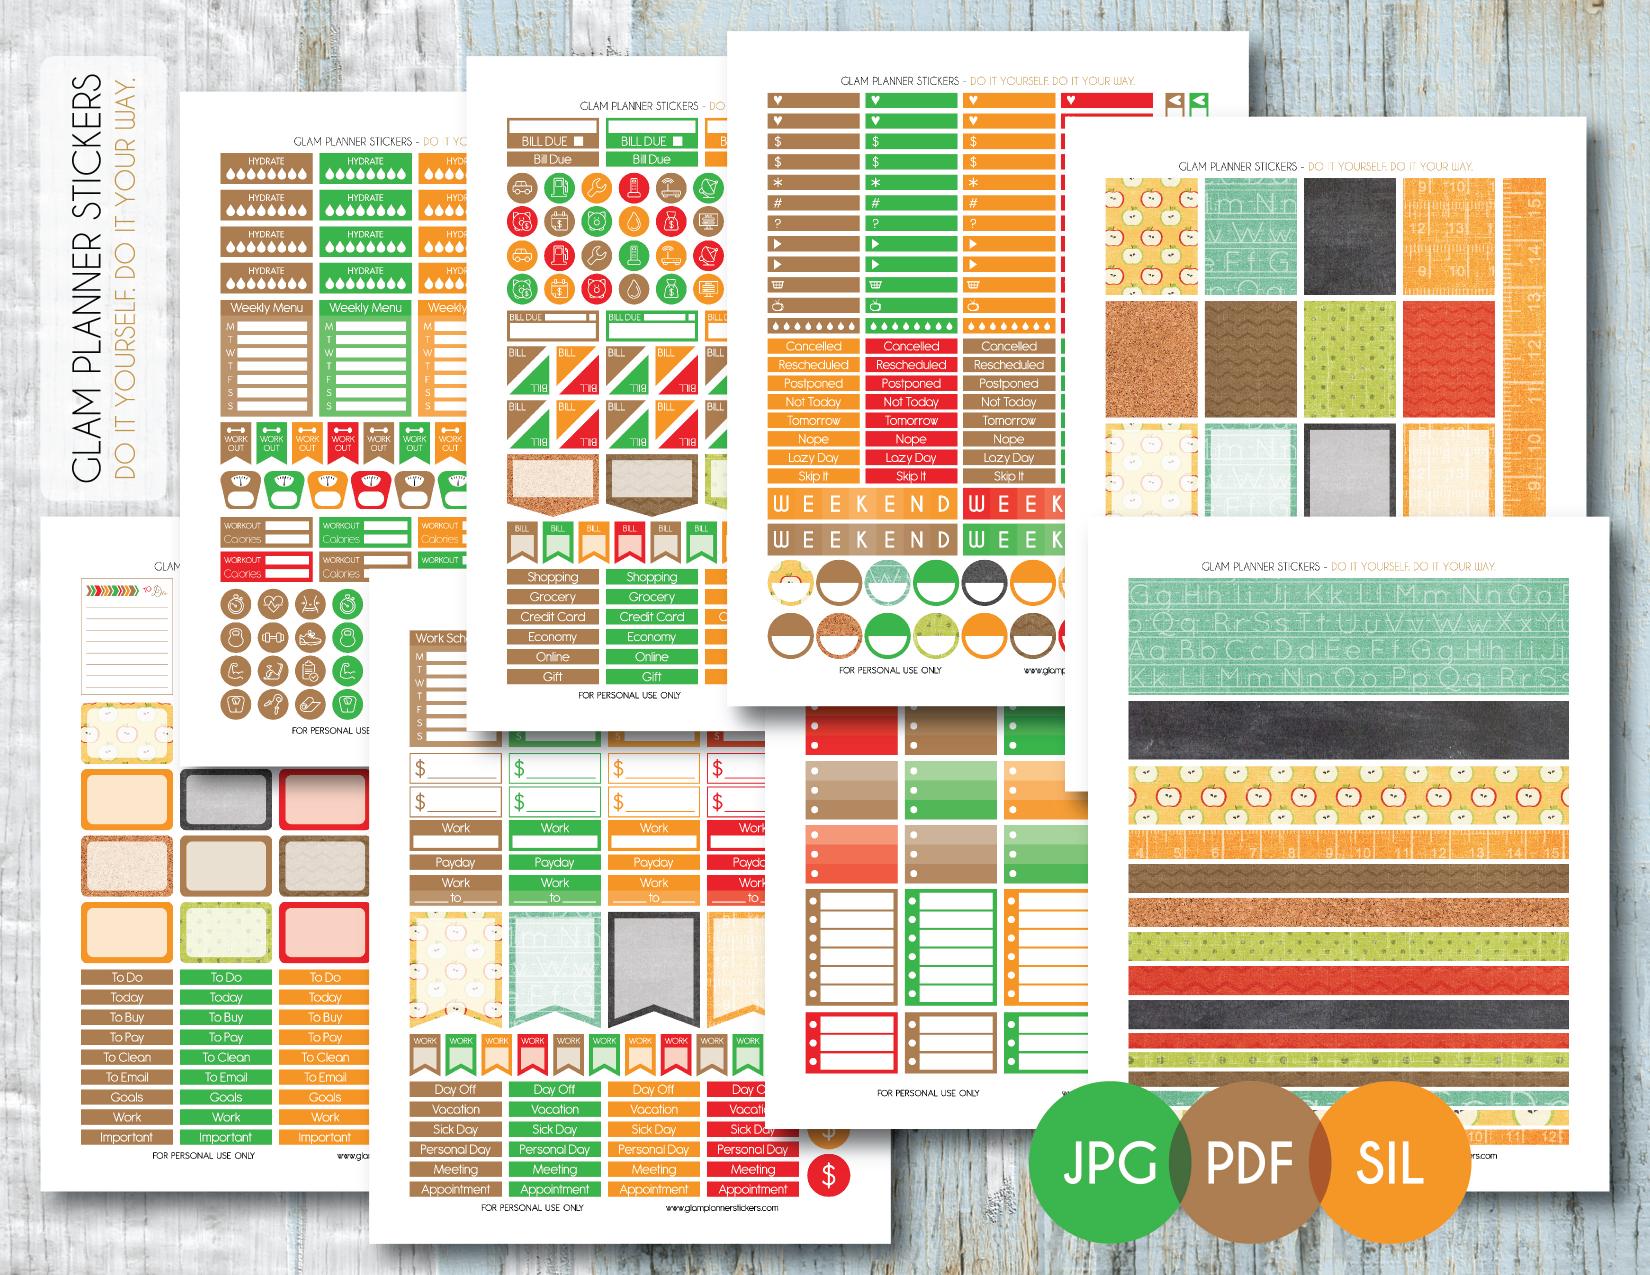 Free Printable Planner Stickers – Planner Addiction - Printable Erin Condren Stickers Free